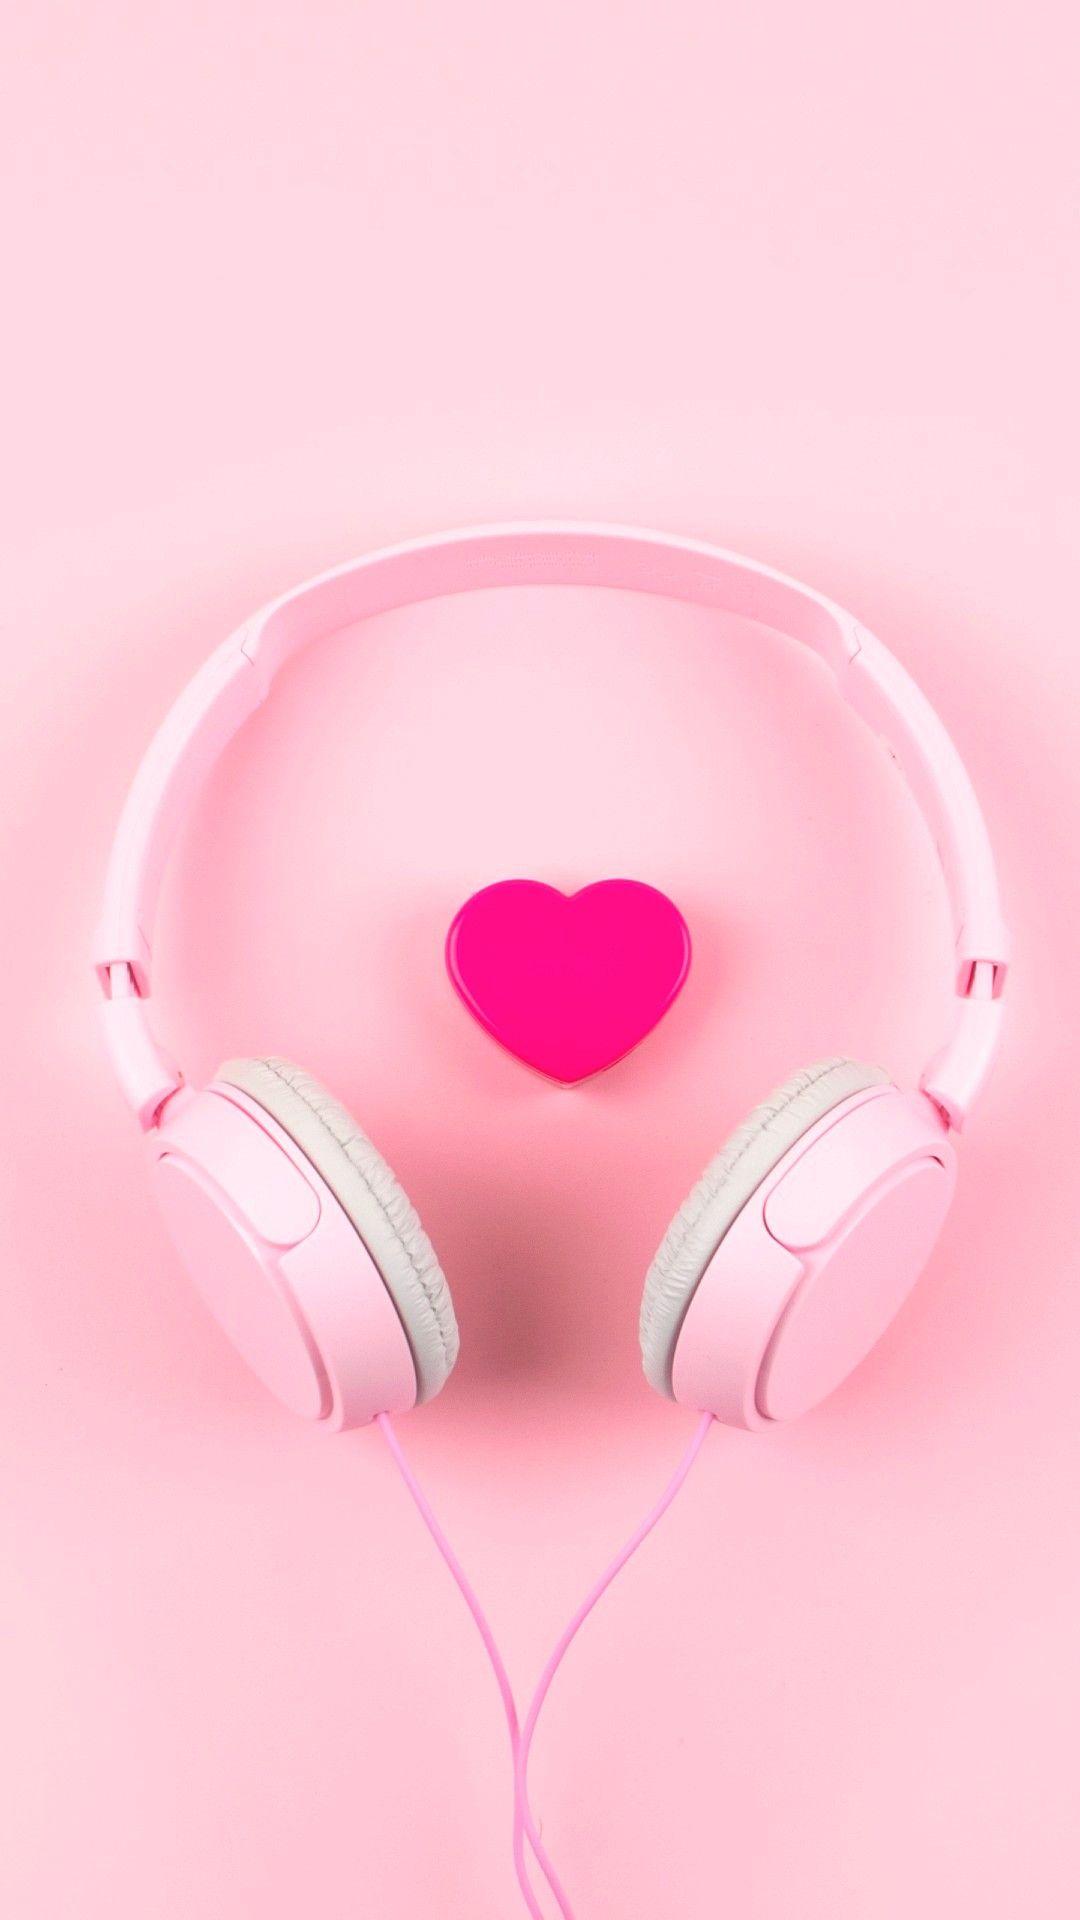 Pink Heart Headphone Hd Wallpapers 1080x1920 Iphone Wallpaper Girly Pink Wallpaper Anime Pink Wallpaper Iphone